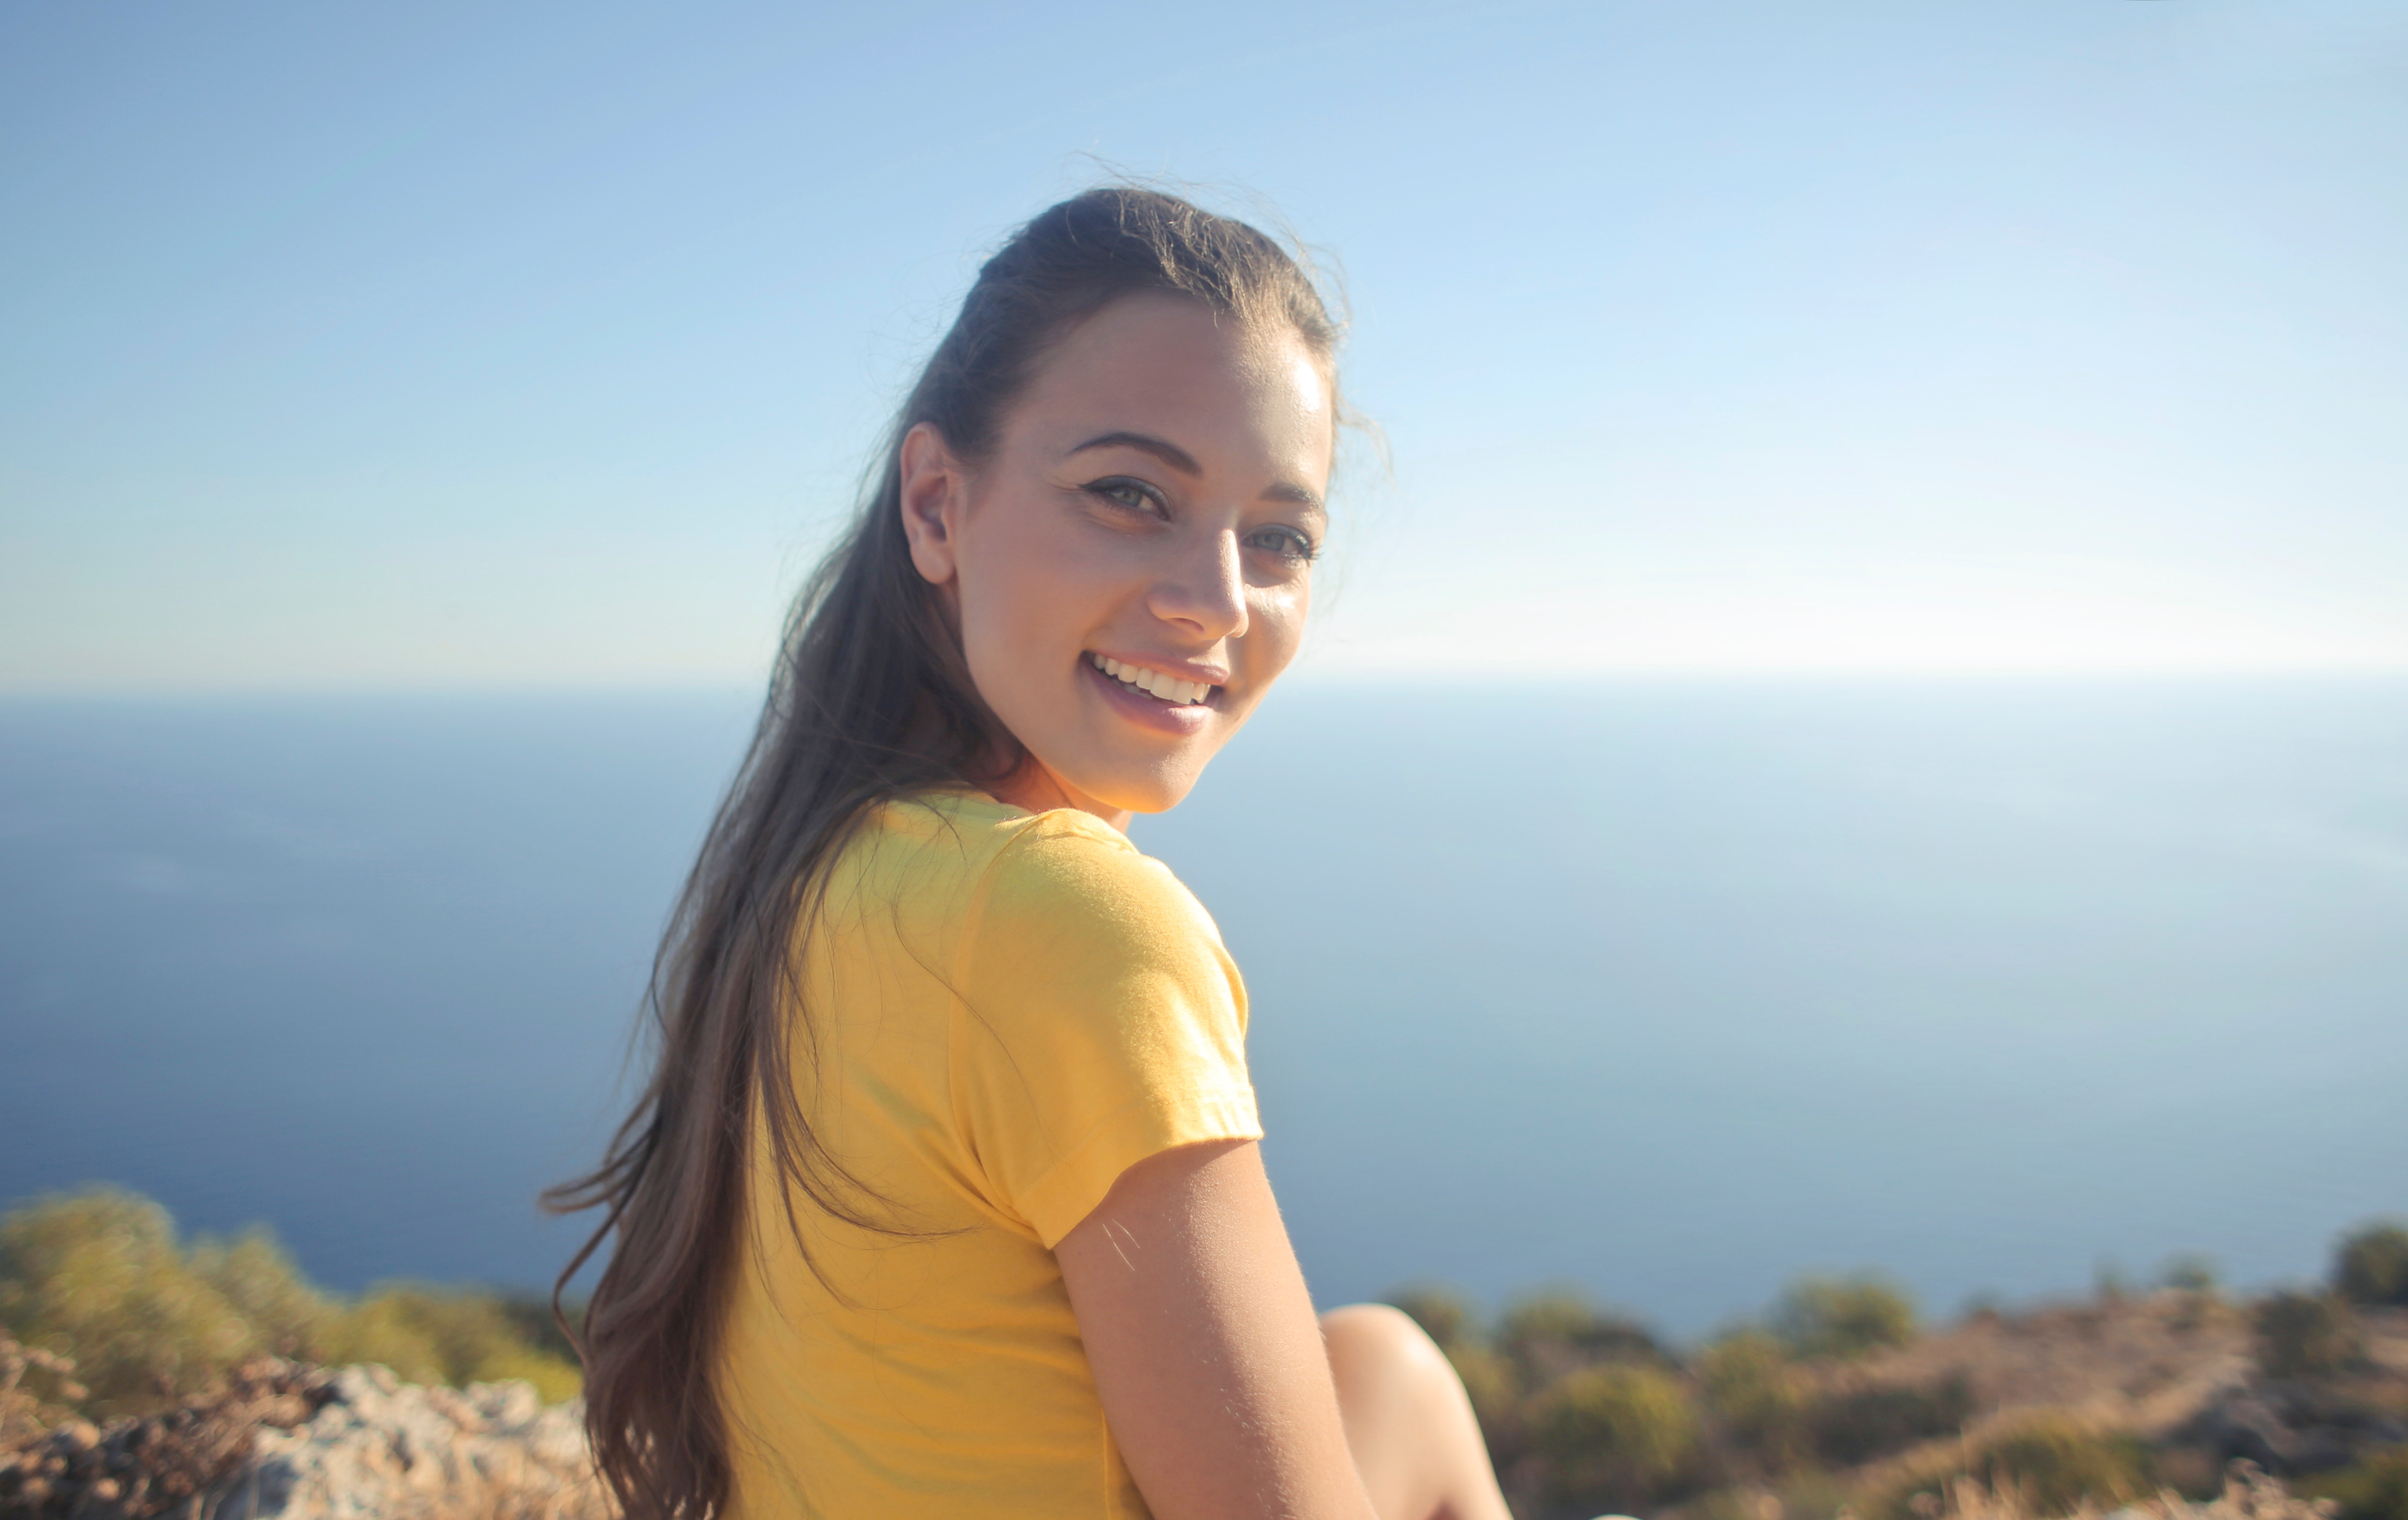 Woman wearing yellow shirt photo